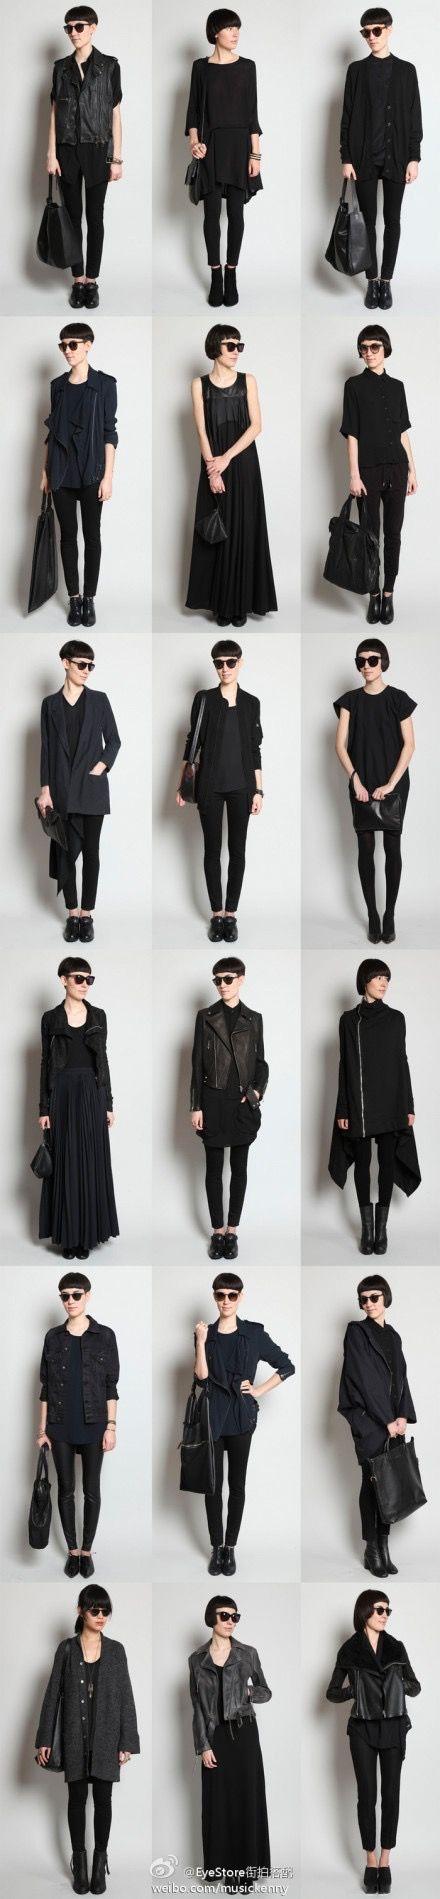 all black eveything